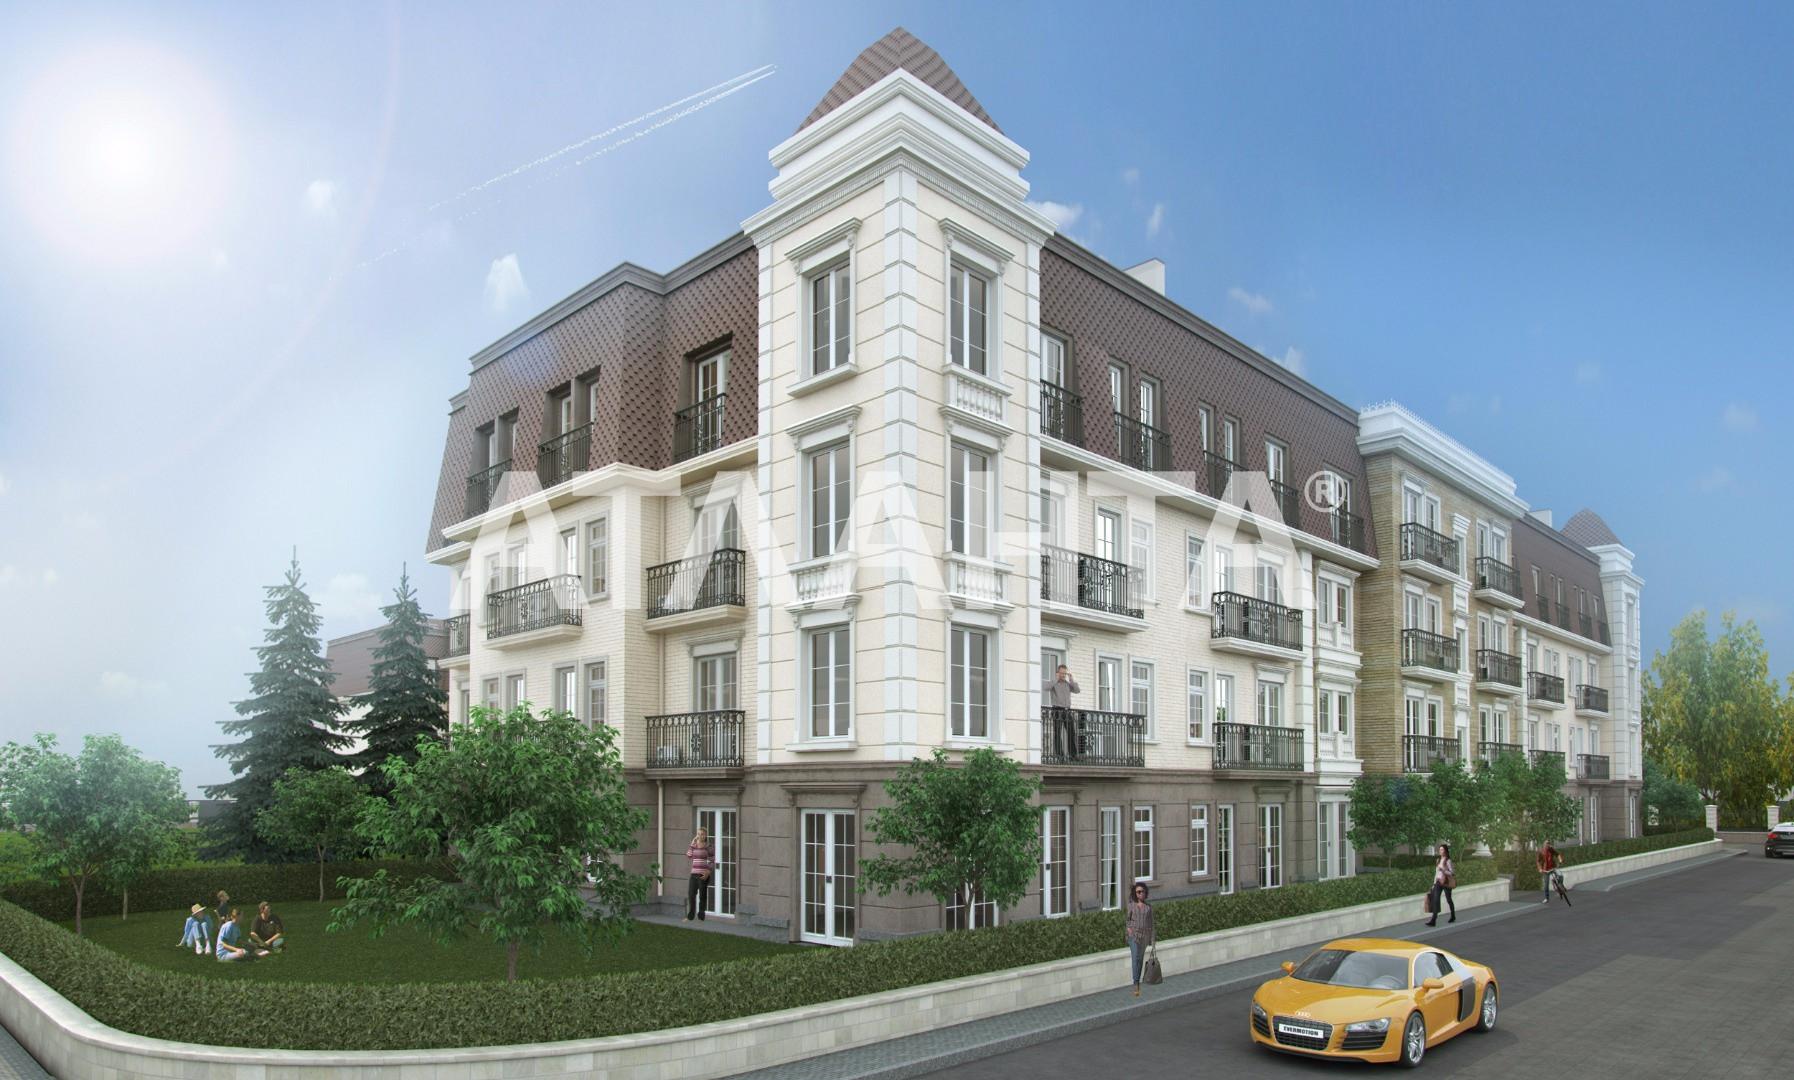 Продается 1-комнатная Квартира на ул. Майский Пер. — 70 120 у.е. (фото №2)